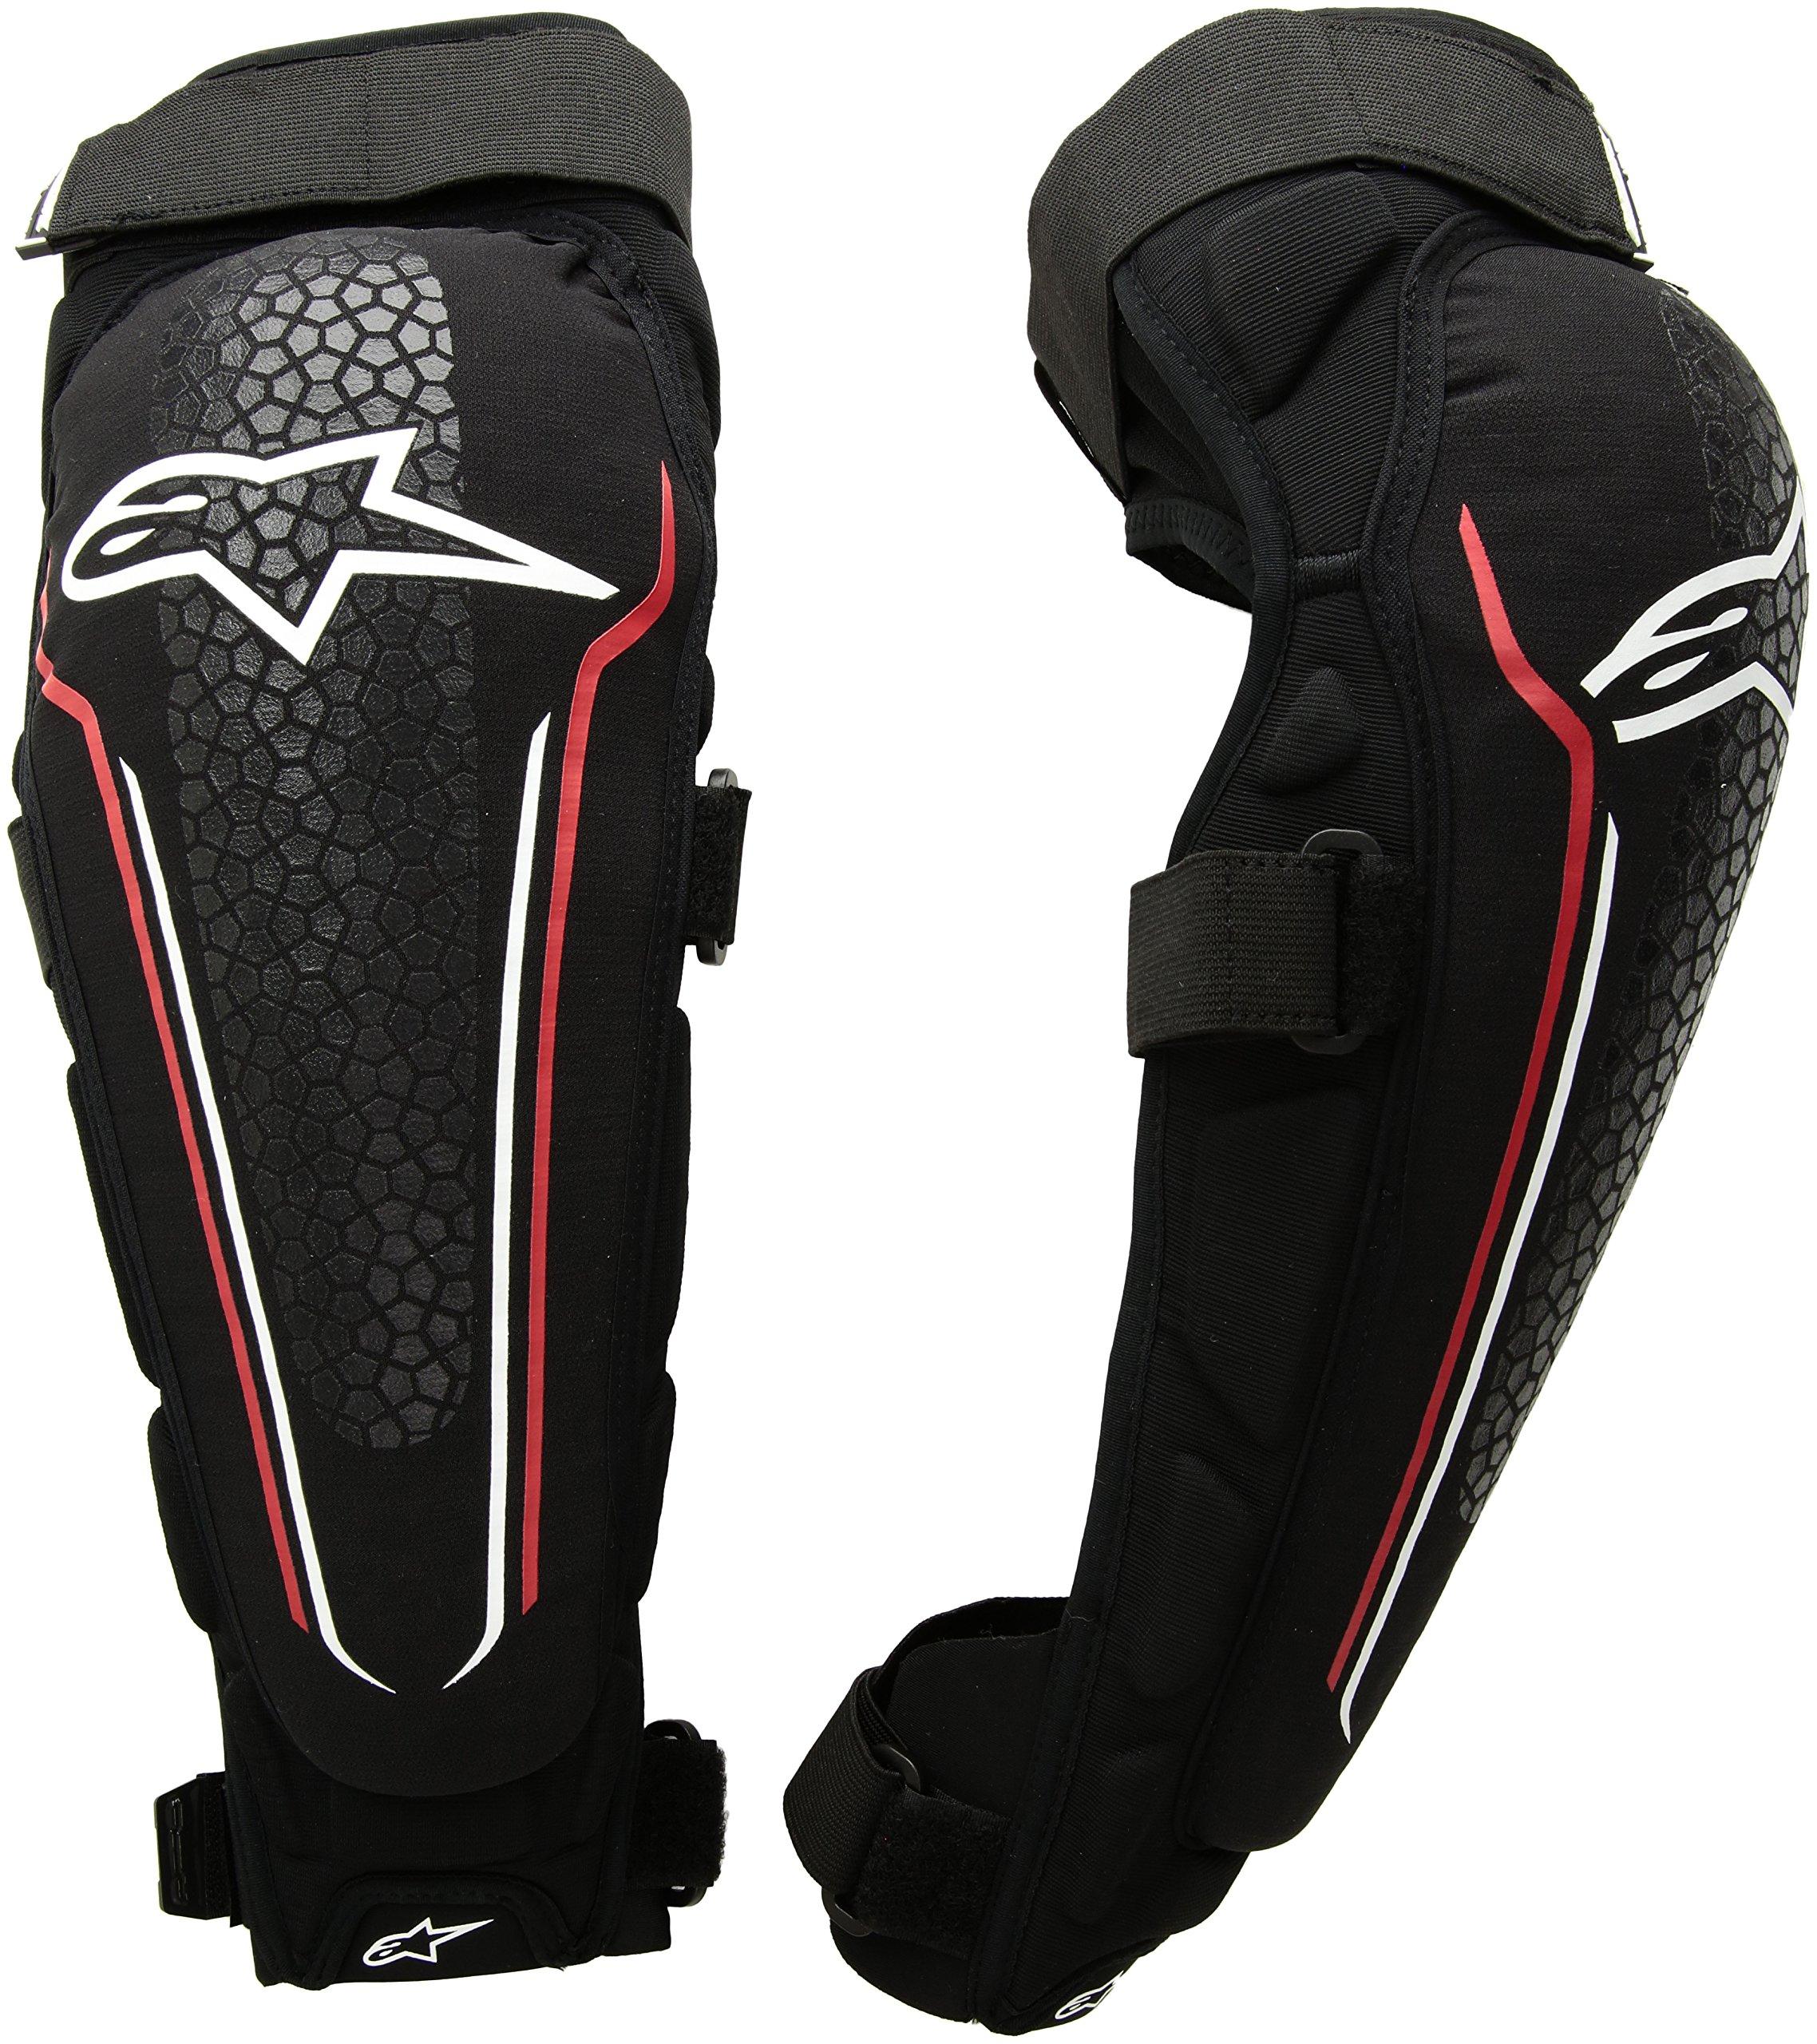 Alpinestars Evolution Knee/Shin Protector, Black/White/Red, Small/Medium